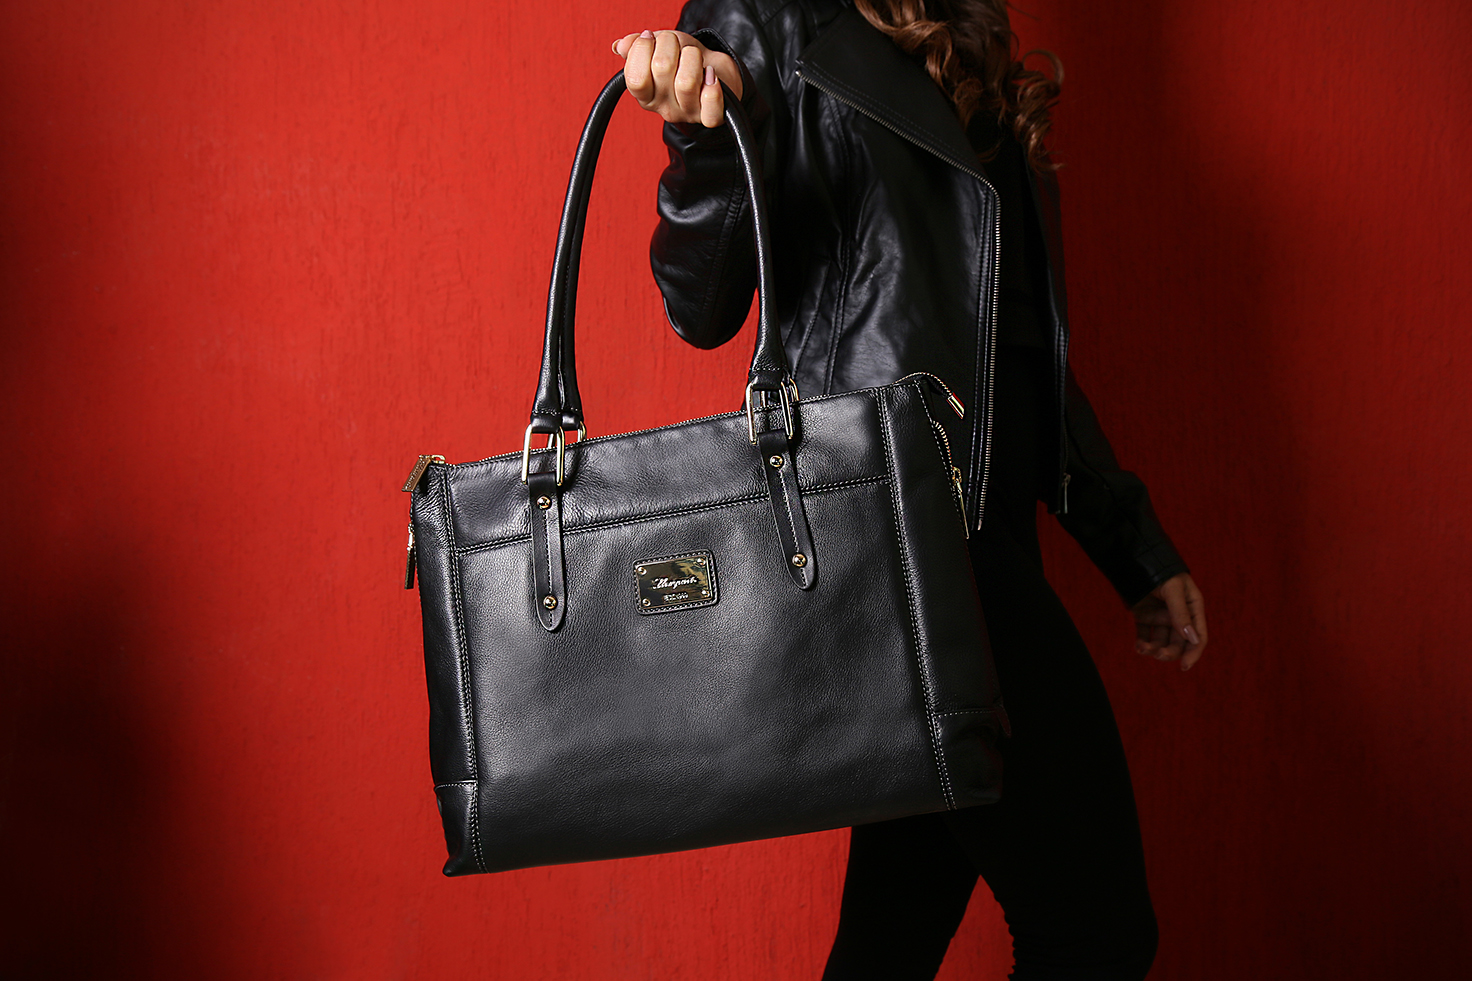 Maroge-Angela-Velazquez-fotografia-producto-diseño-15